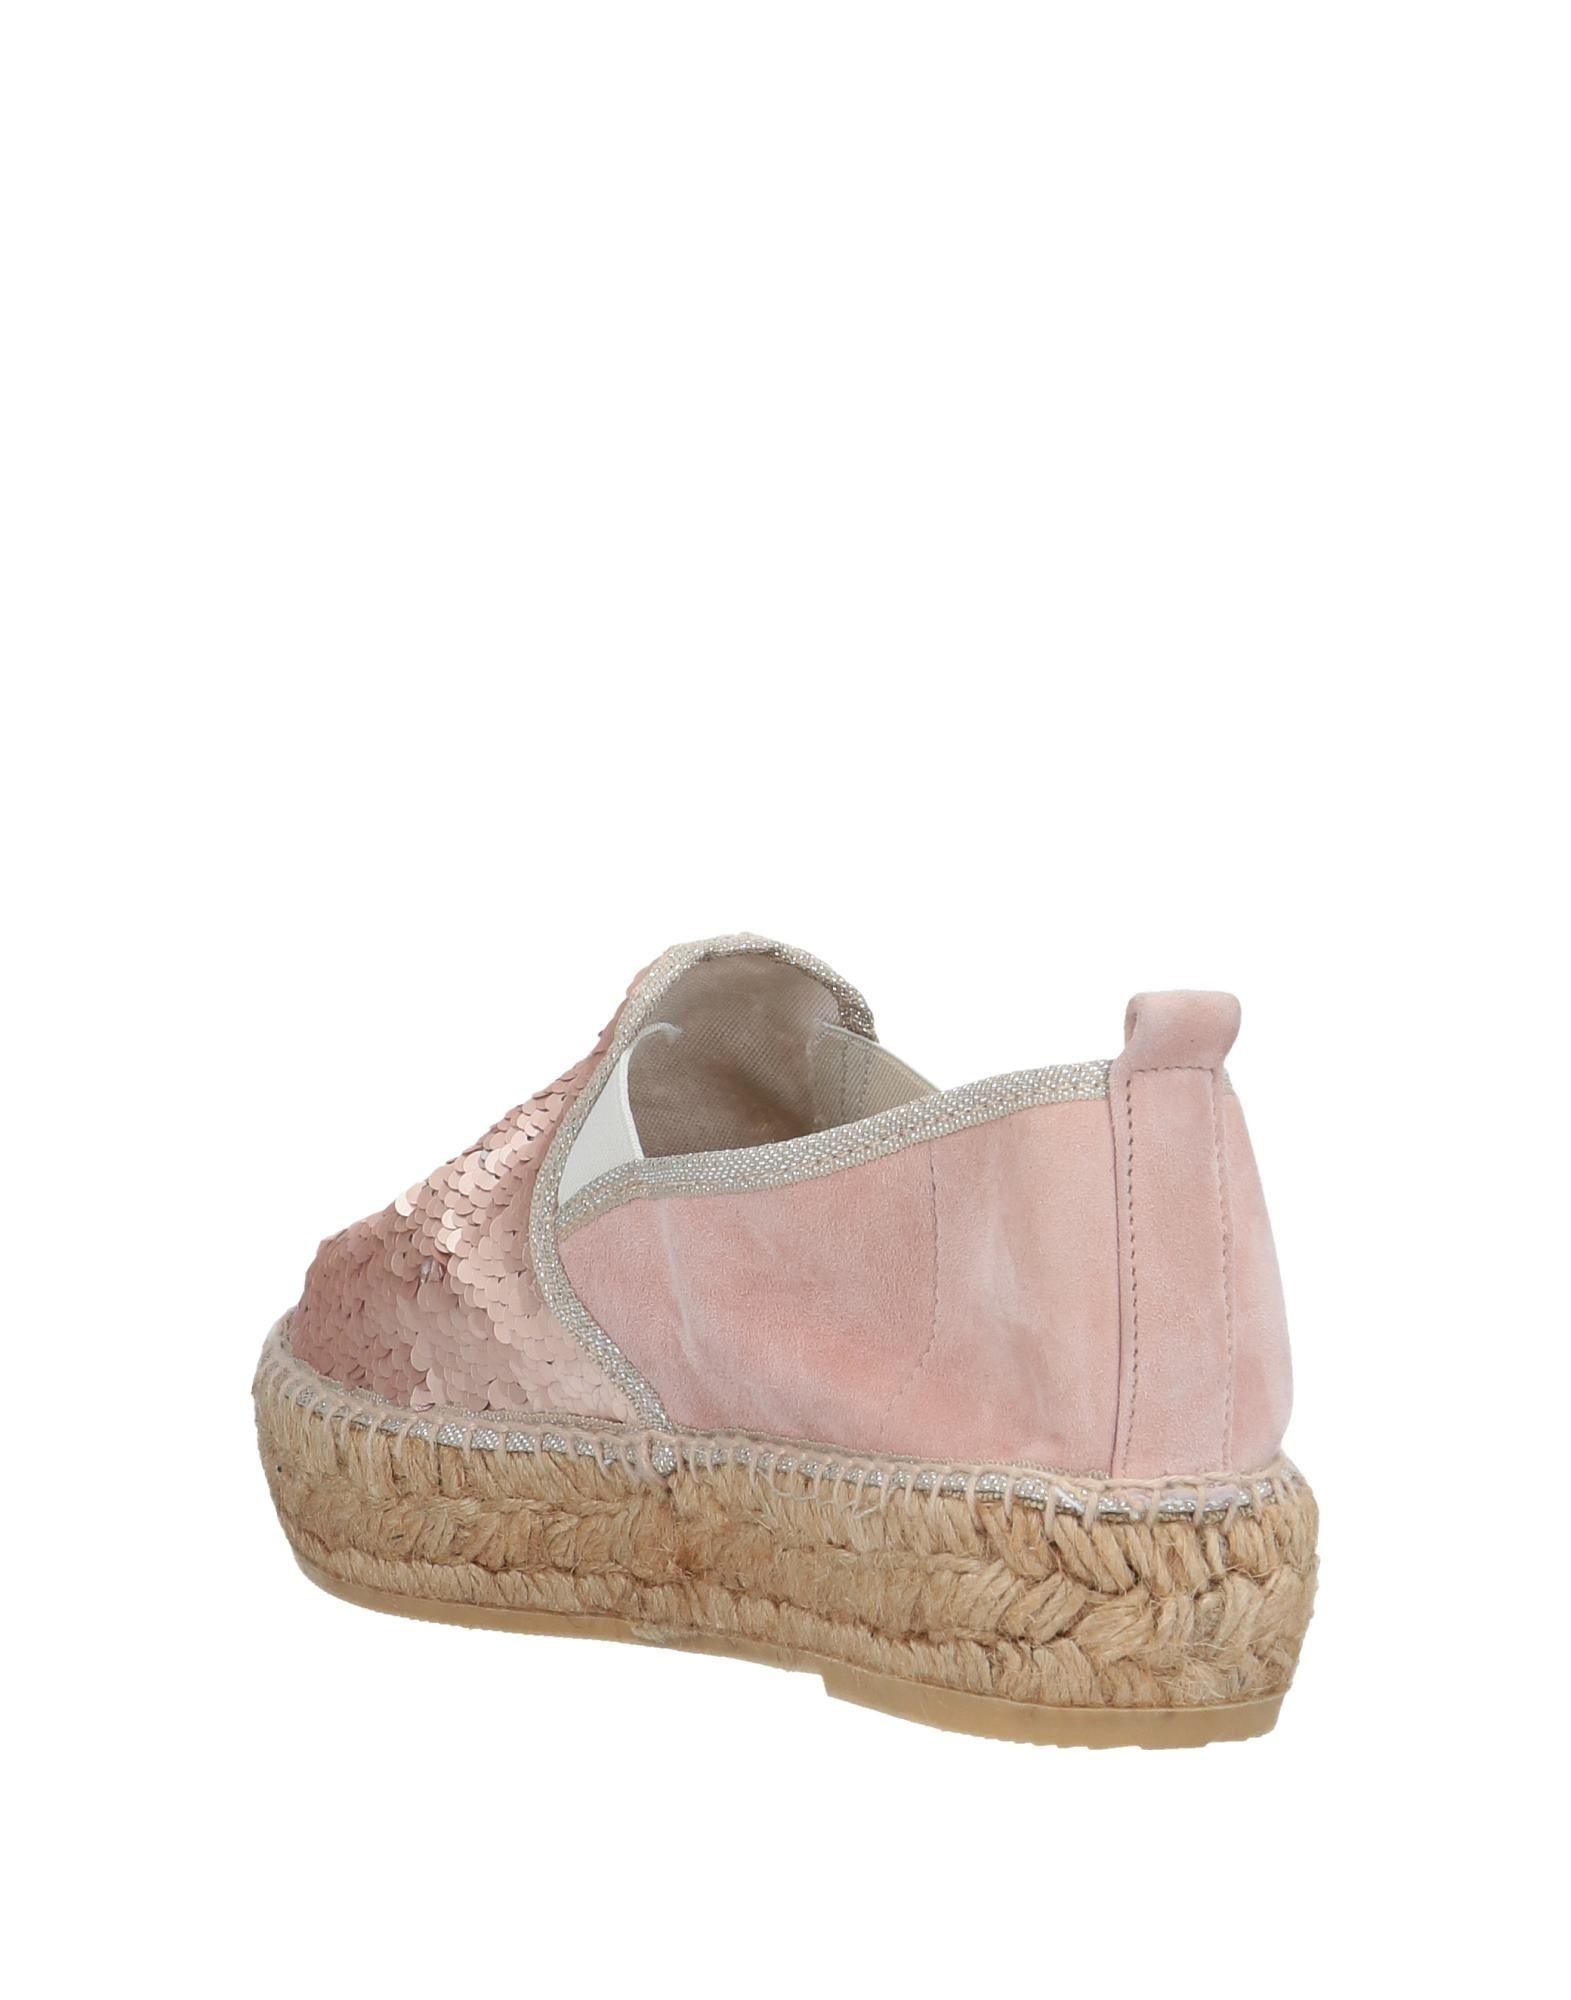 Montané 11559370KJ Espadrilles Damen  11559370KJ Montané Gute Qualität beliebte Schuhe 6af141